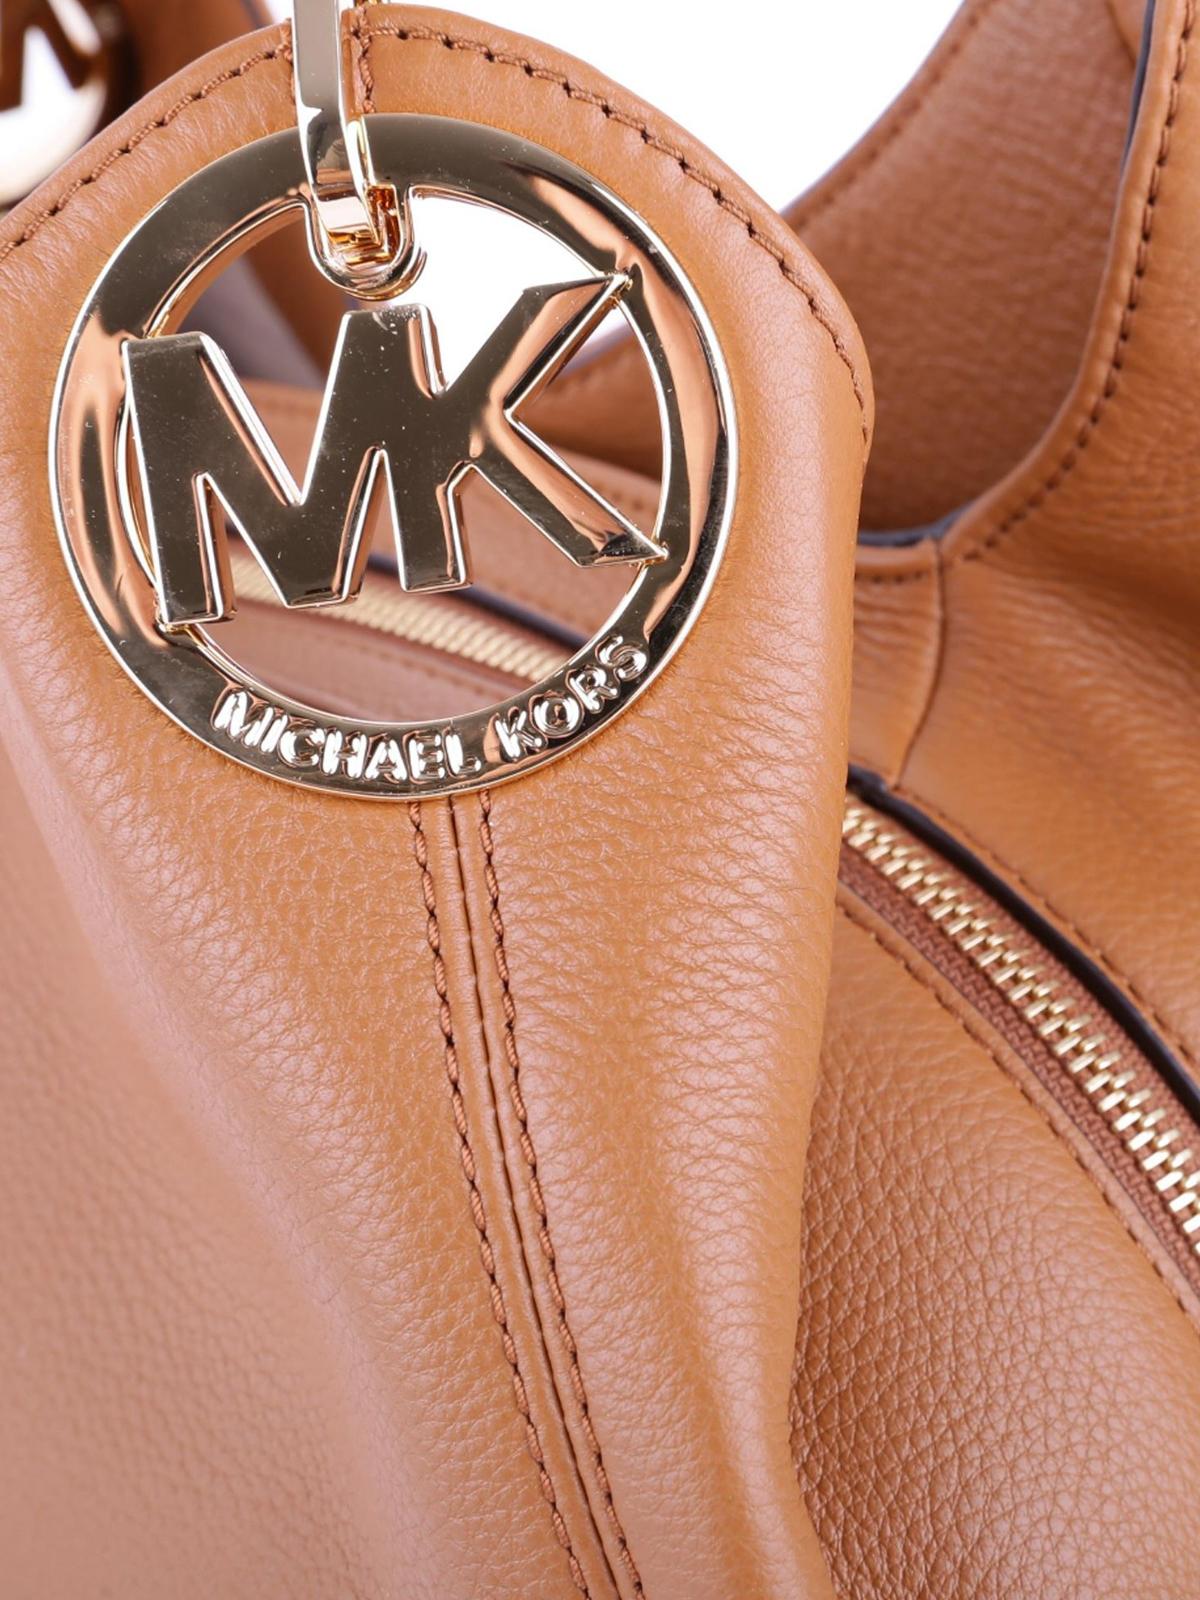 983a79d0b9e7 Michael Kors - Fulton large acorn leather shoulder bag - shoulder ...